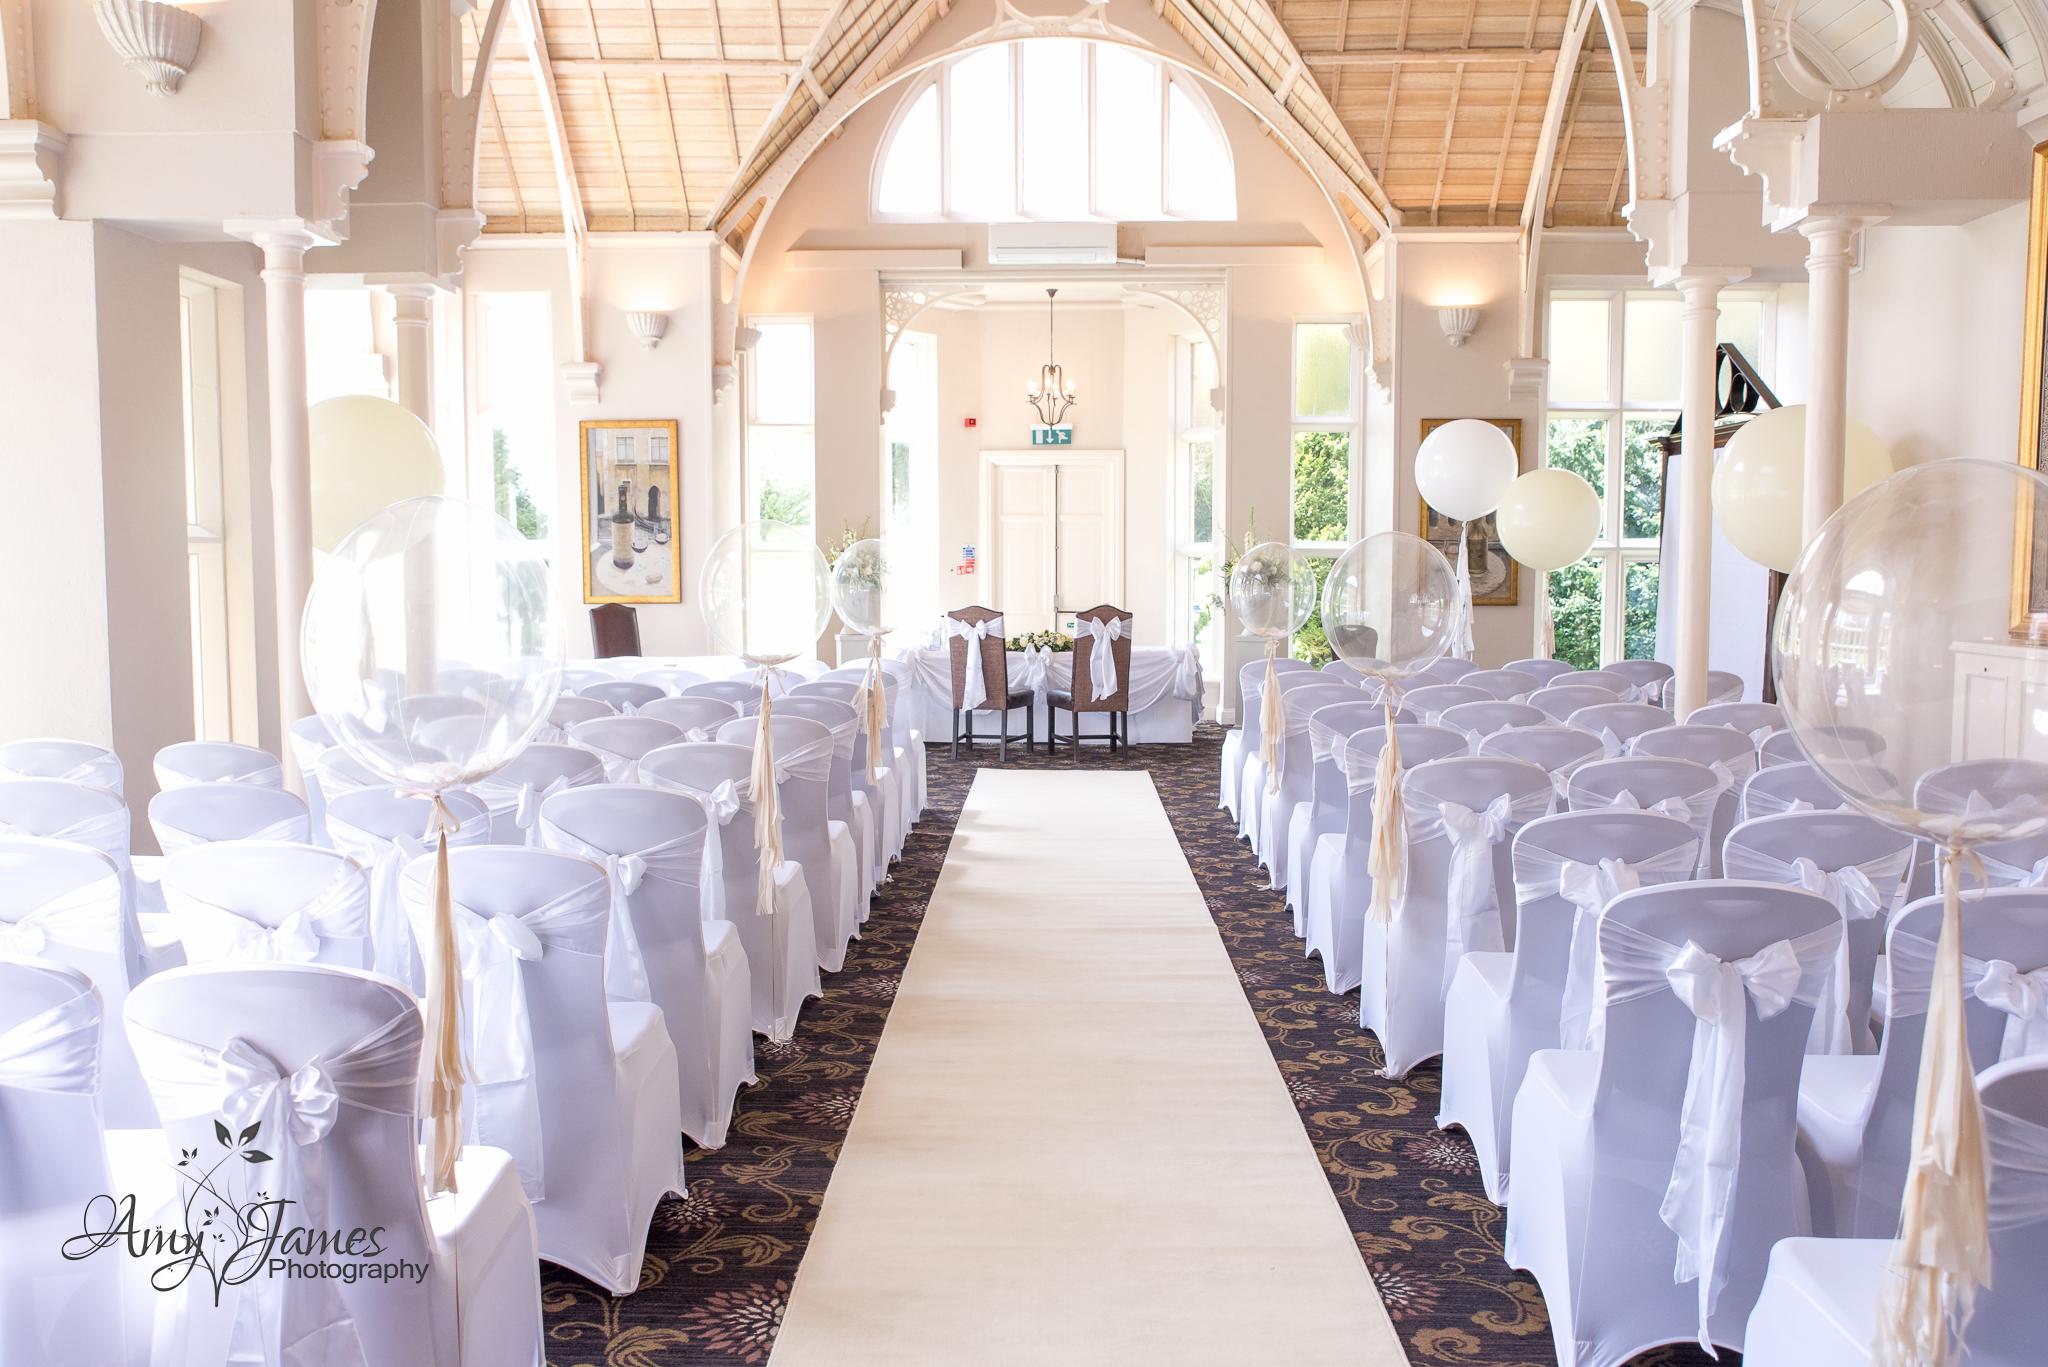 Amy James Photography // Wedding photographer Hampshire // Hampshire wedding venues // Fleet wedding photographer // Audleys Wood Hotel wedding